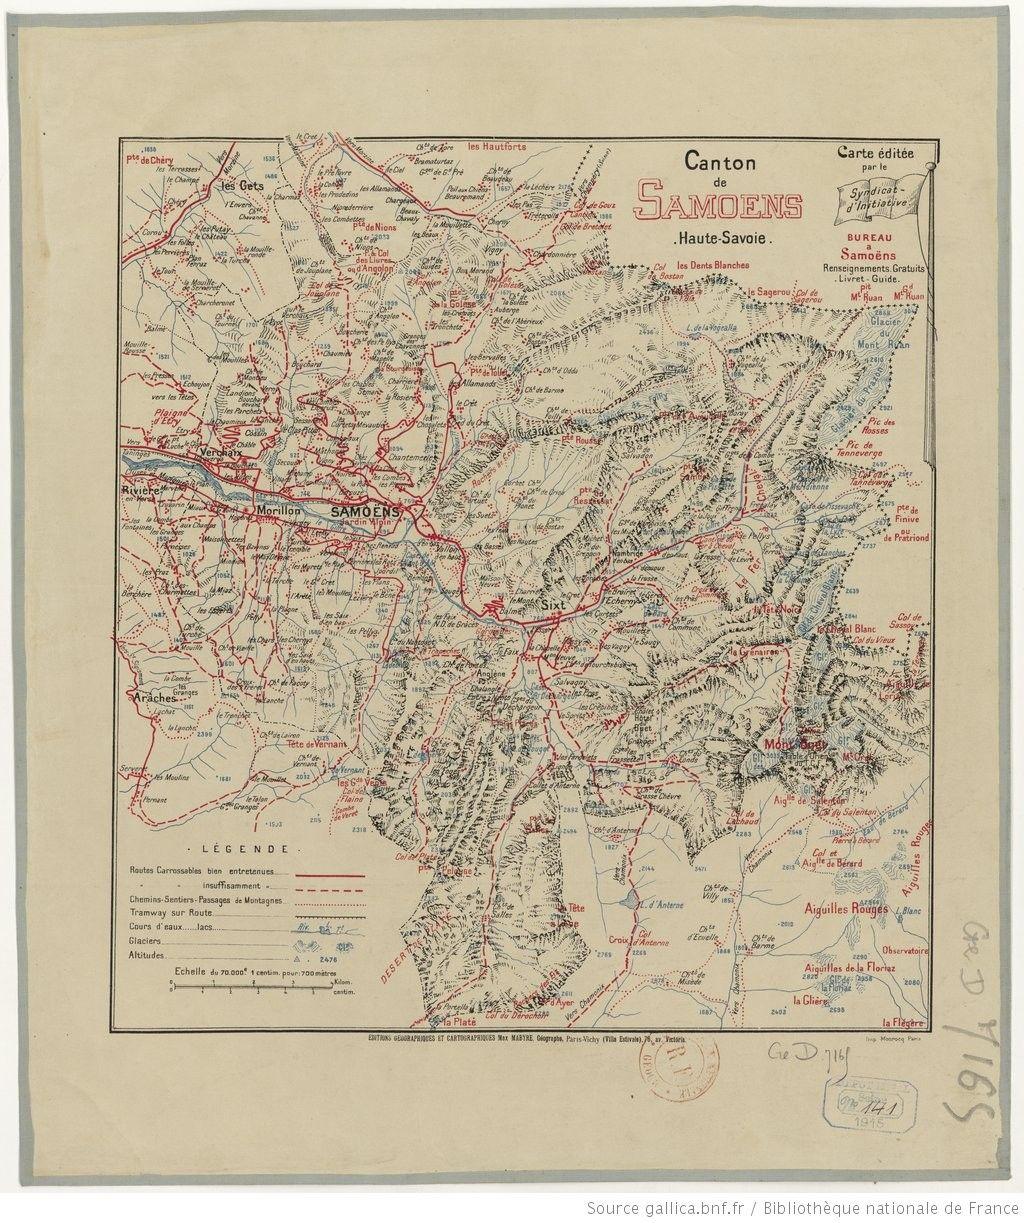 Syndicat d'initiative (Samoens, Haute-Savoie) (1915) Canton de Samoens, Haute-Savoie. Is : M. Mahyre, 1 carte coul. ; 30 x 33 cm [http://catalogue.bnf.fr/ark:/12148/cb407614488]